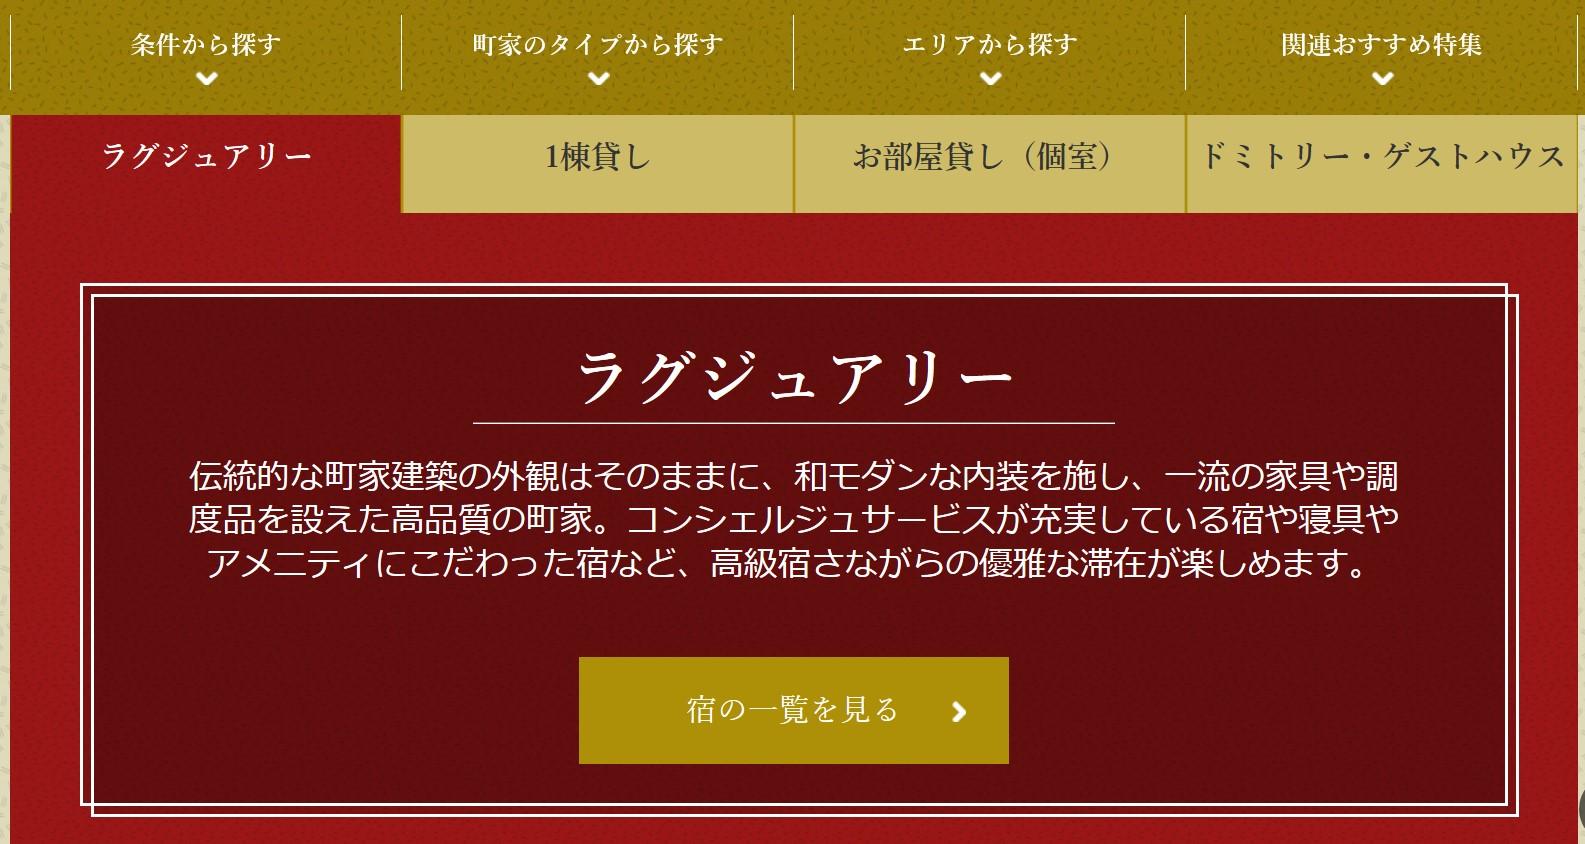 https://www.usagi-yado.com/blog/assets_c/JTB%E7%94%BA%E5%AE%B6%E7%89%B9%E9%9B%86.jpg